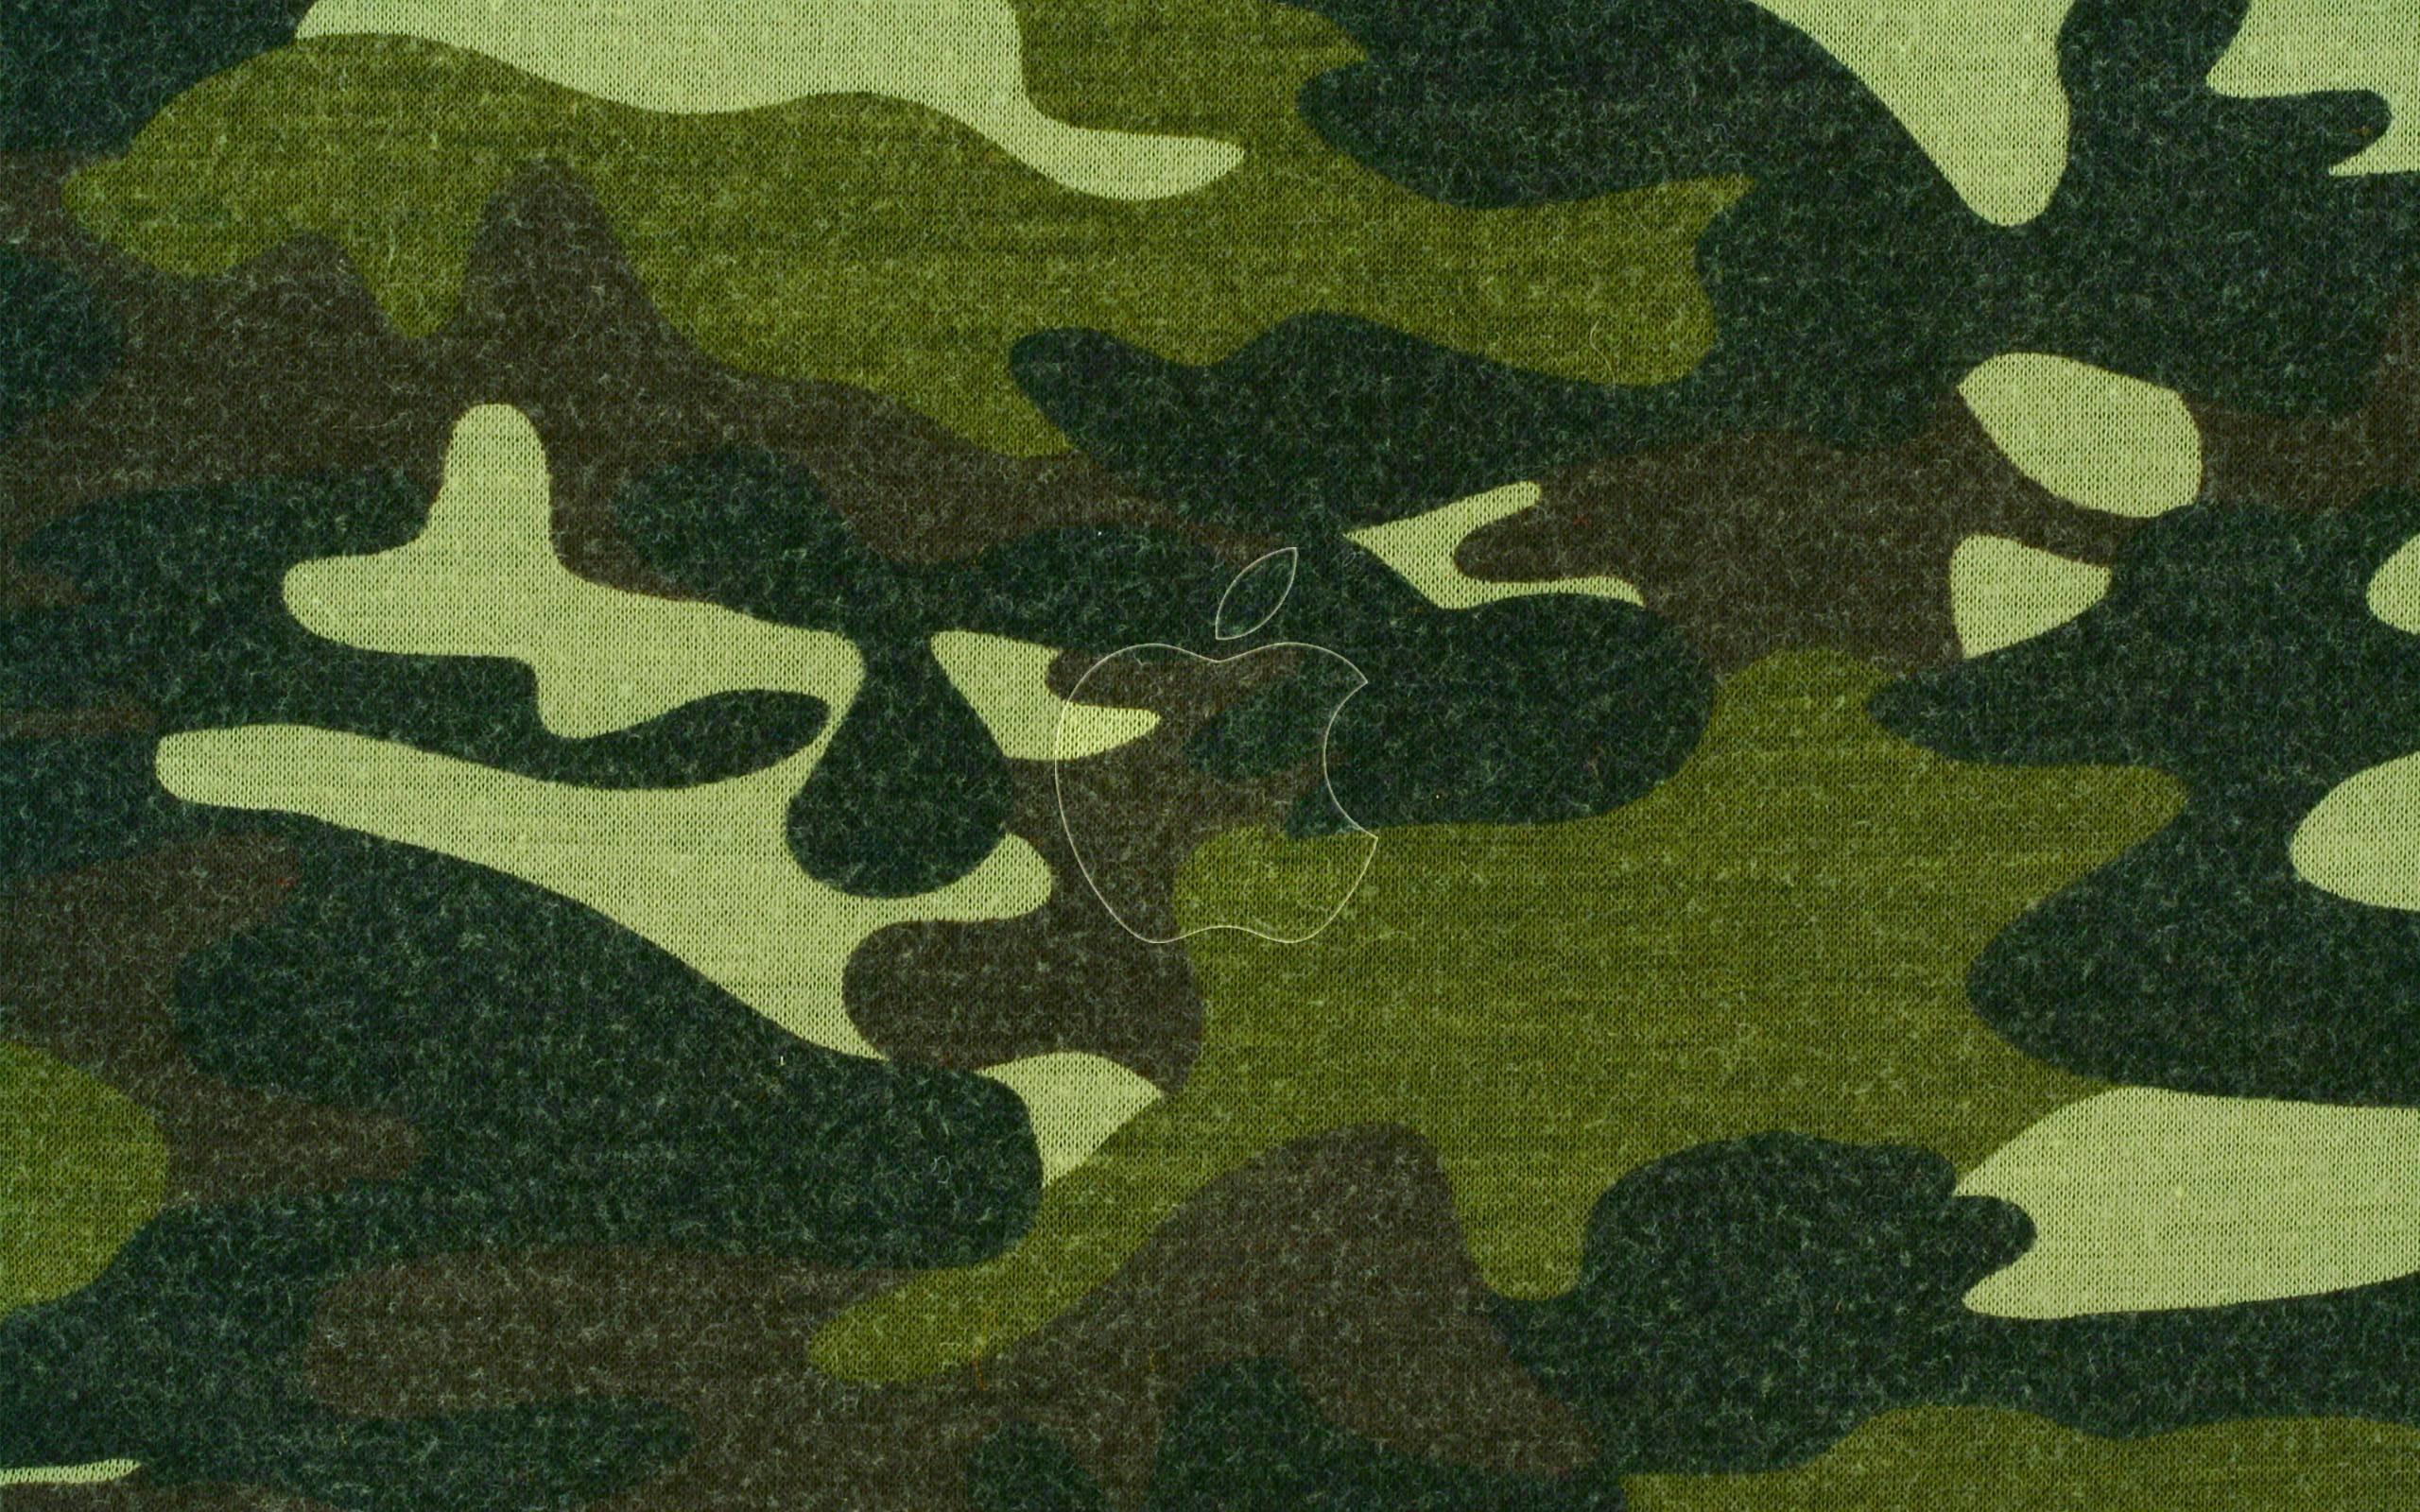 Camouflage Wallpaper | Desktop Wallpaper